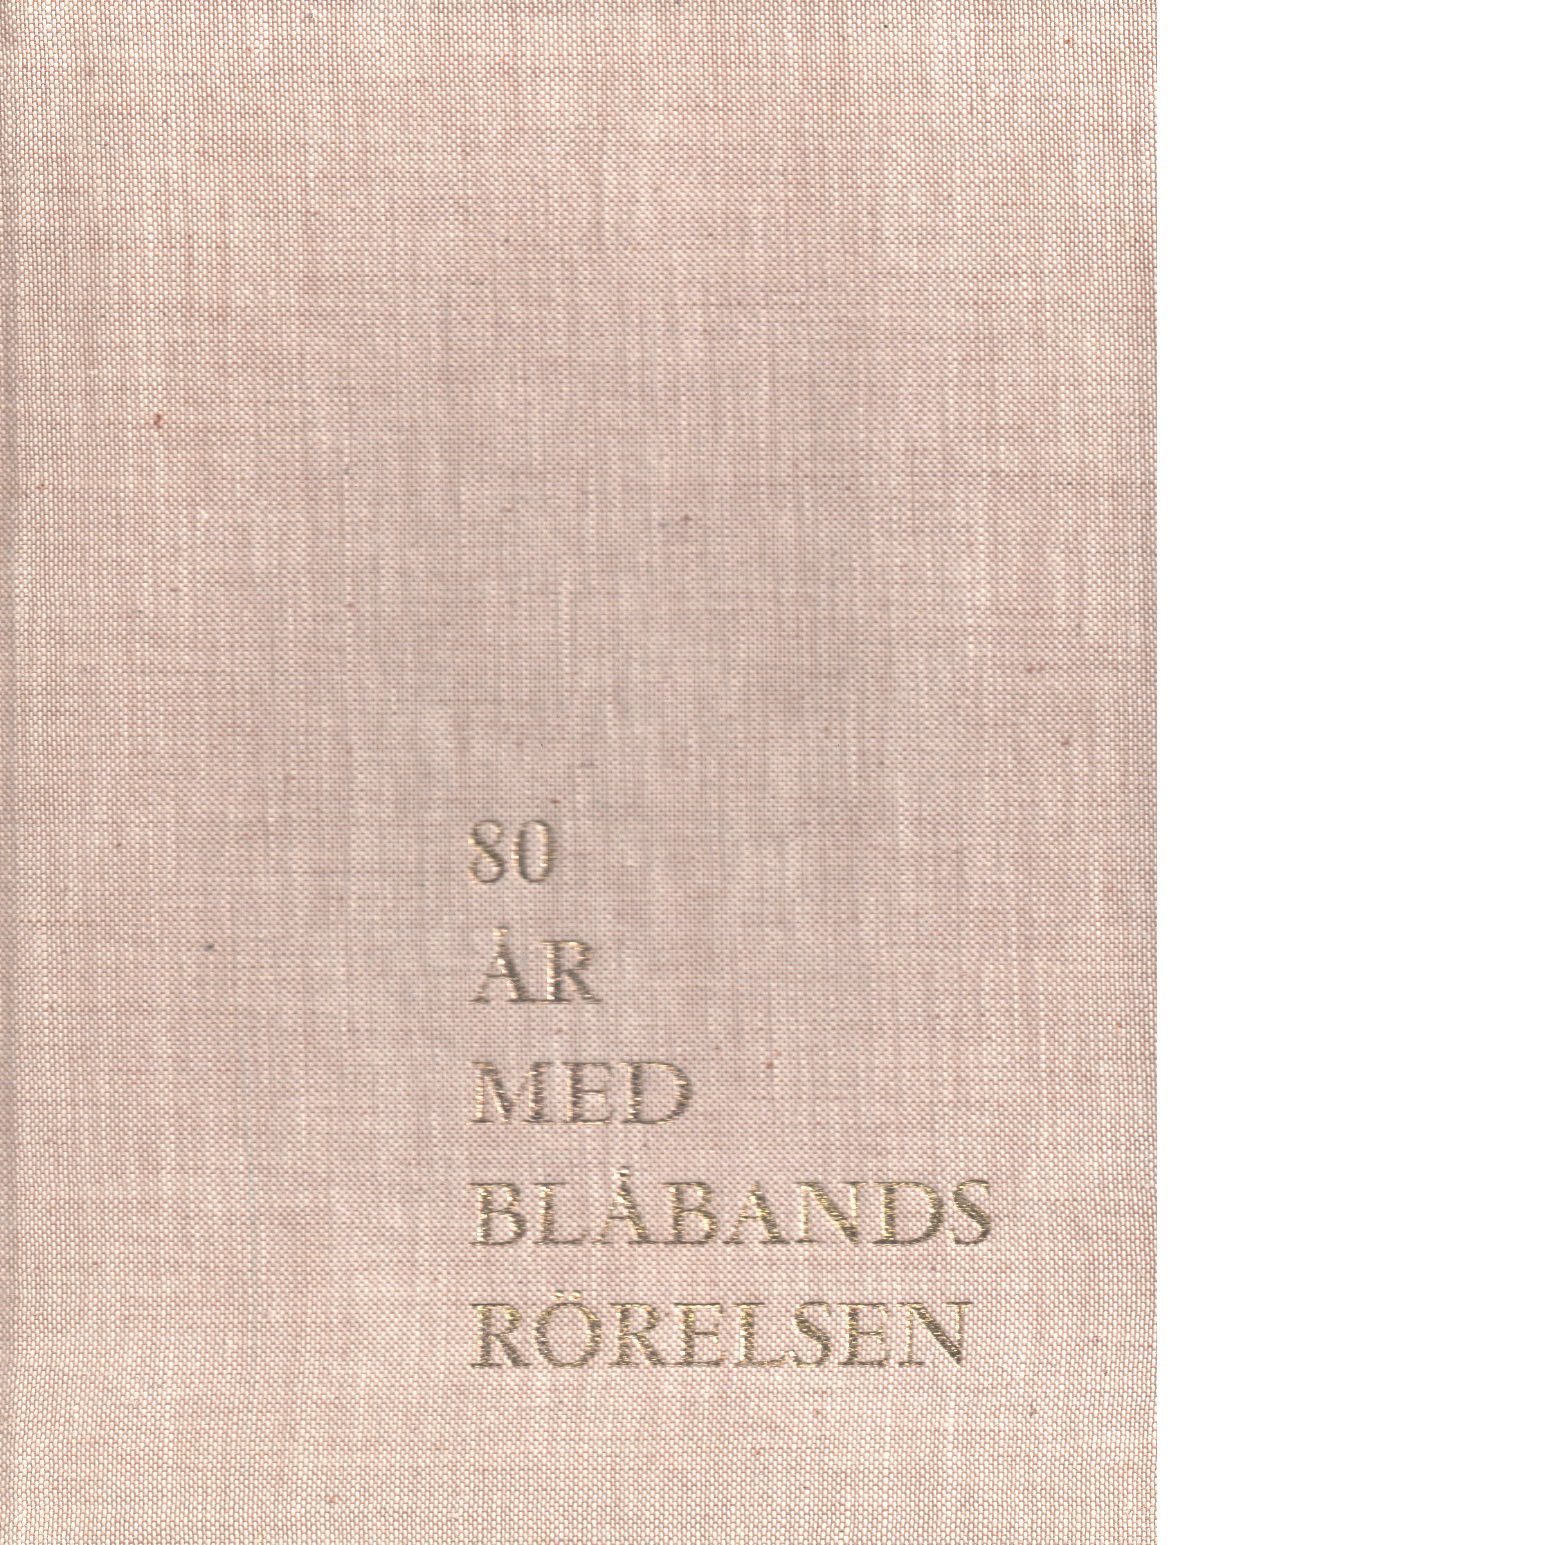 80 år med blåbandsrörelsen - Eriksson, Sven Magnus